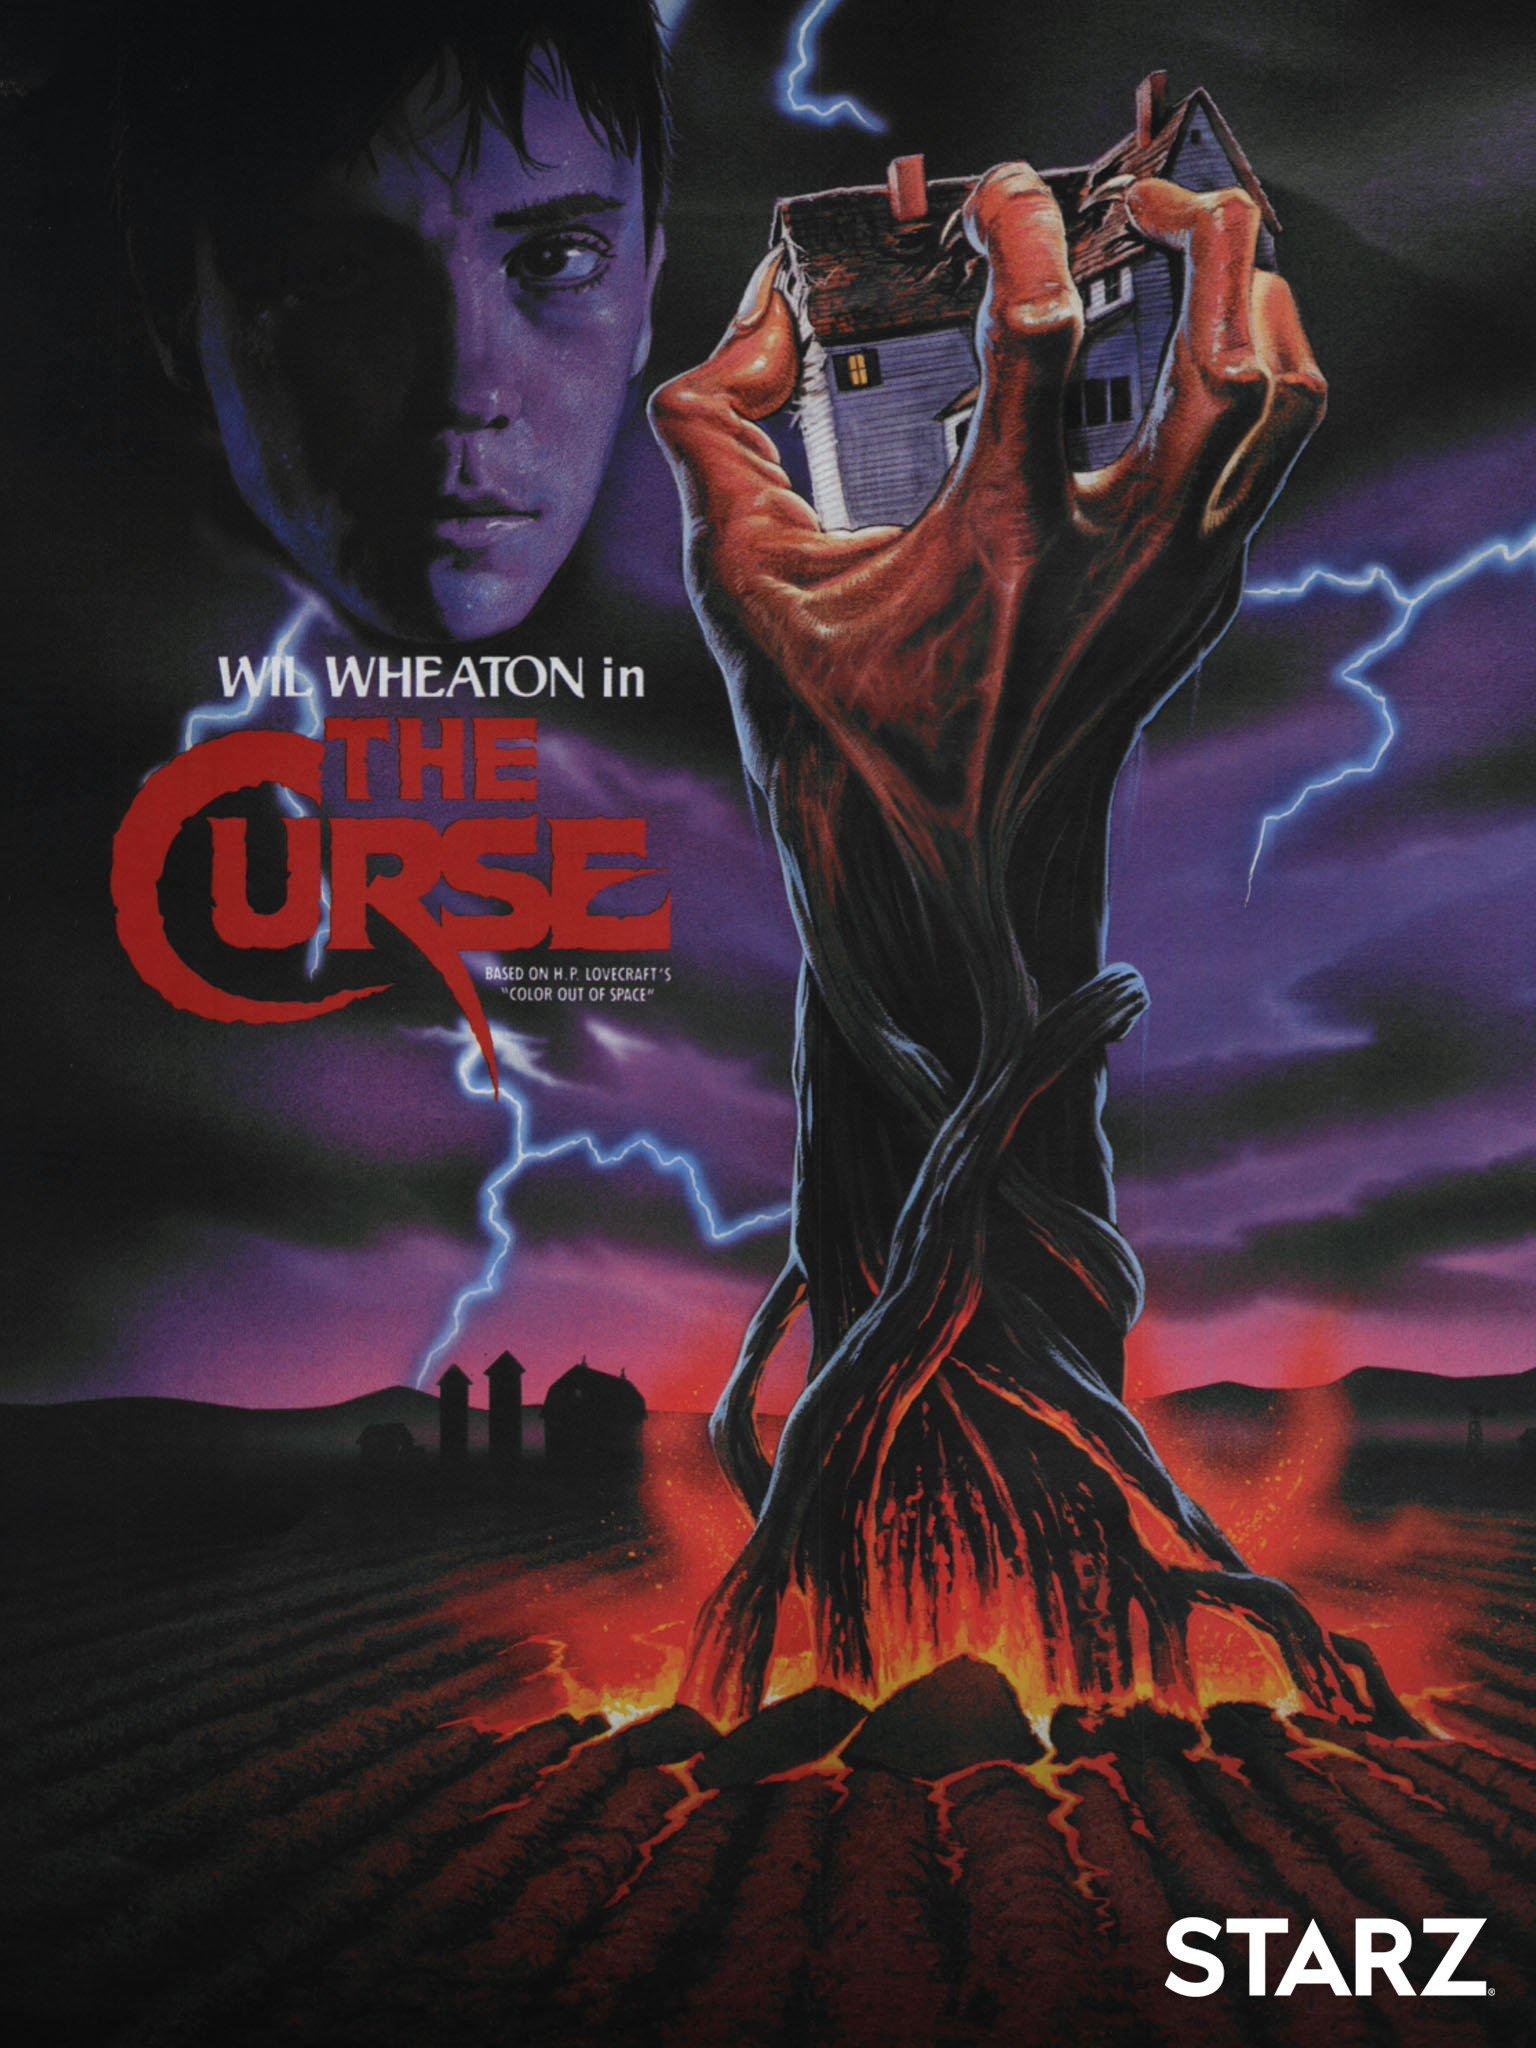 Amazon.com: Watch The Curse   Prime Video